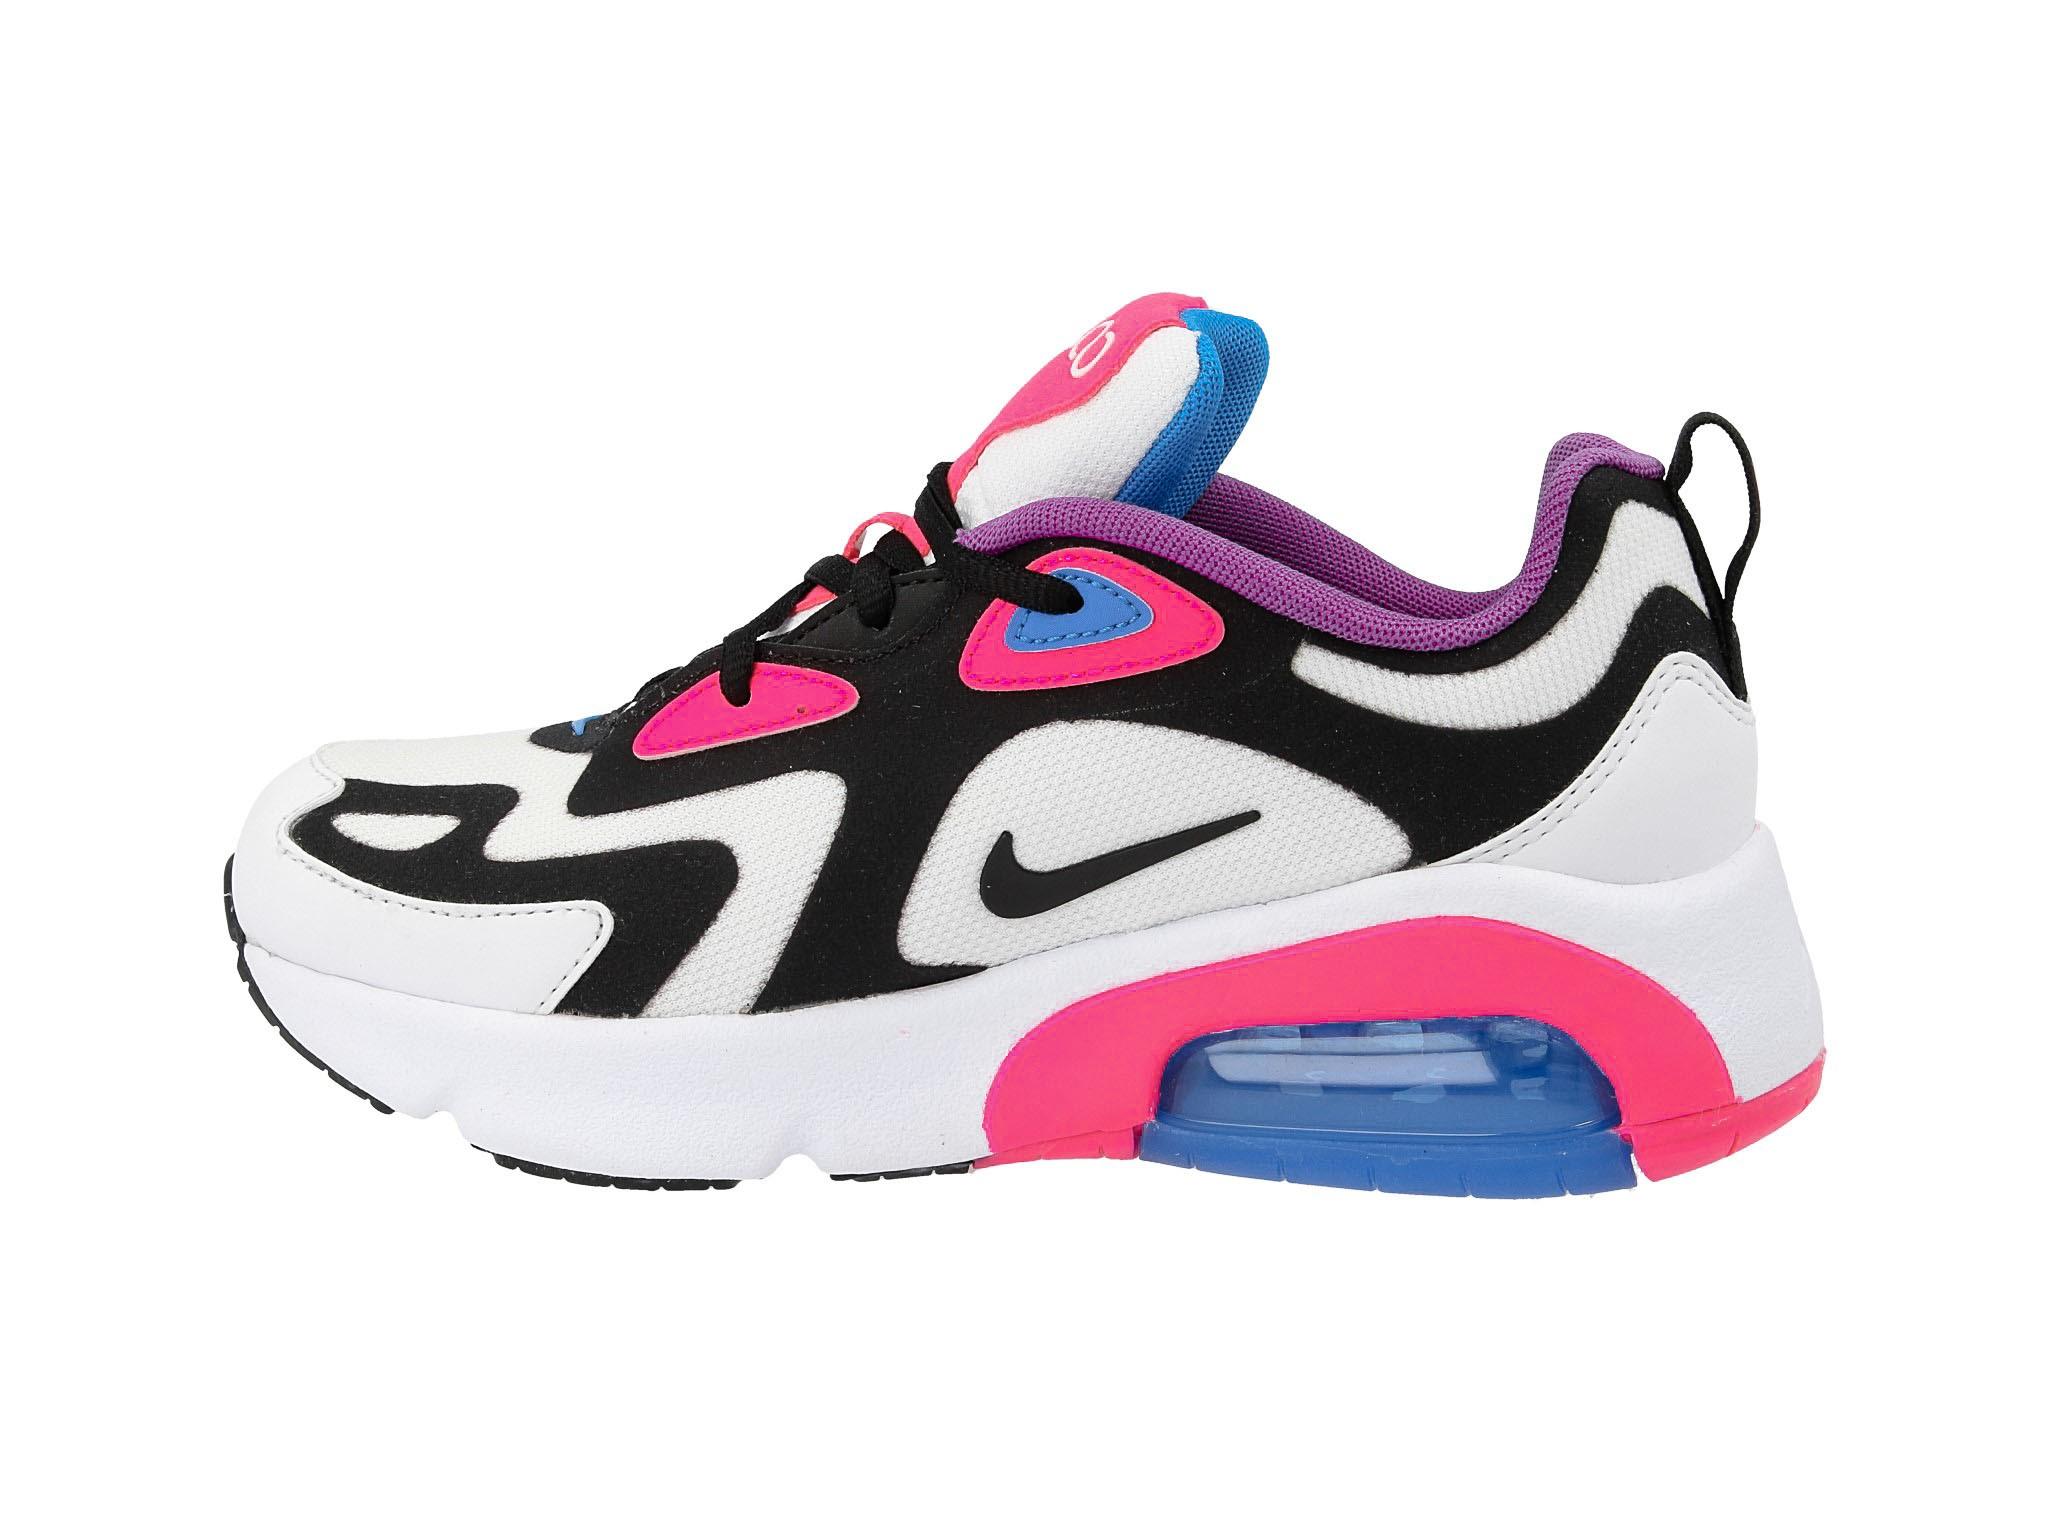 Cipő NIKE Air Max 200 (GS) AT5630 100 WhiteBlack Hyper Pink